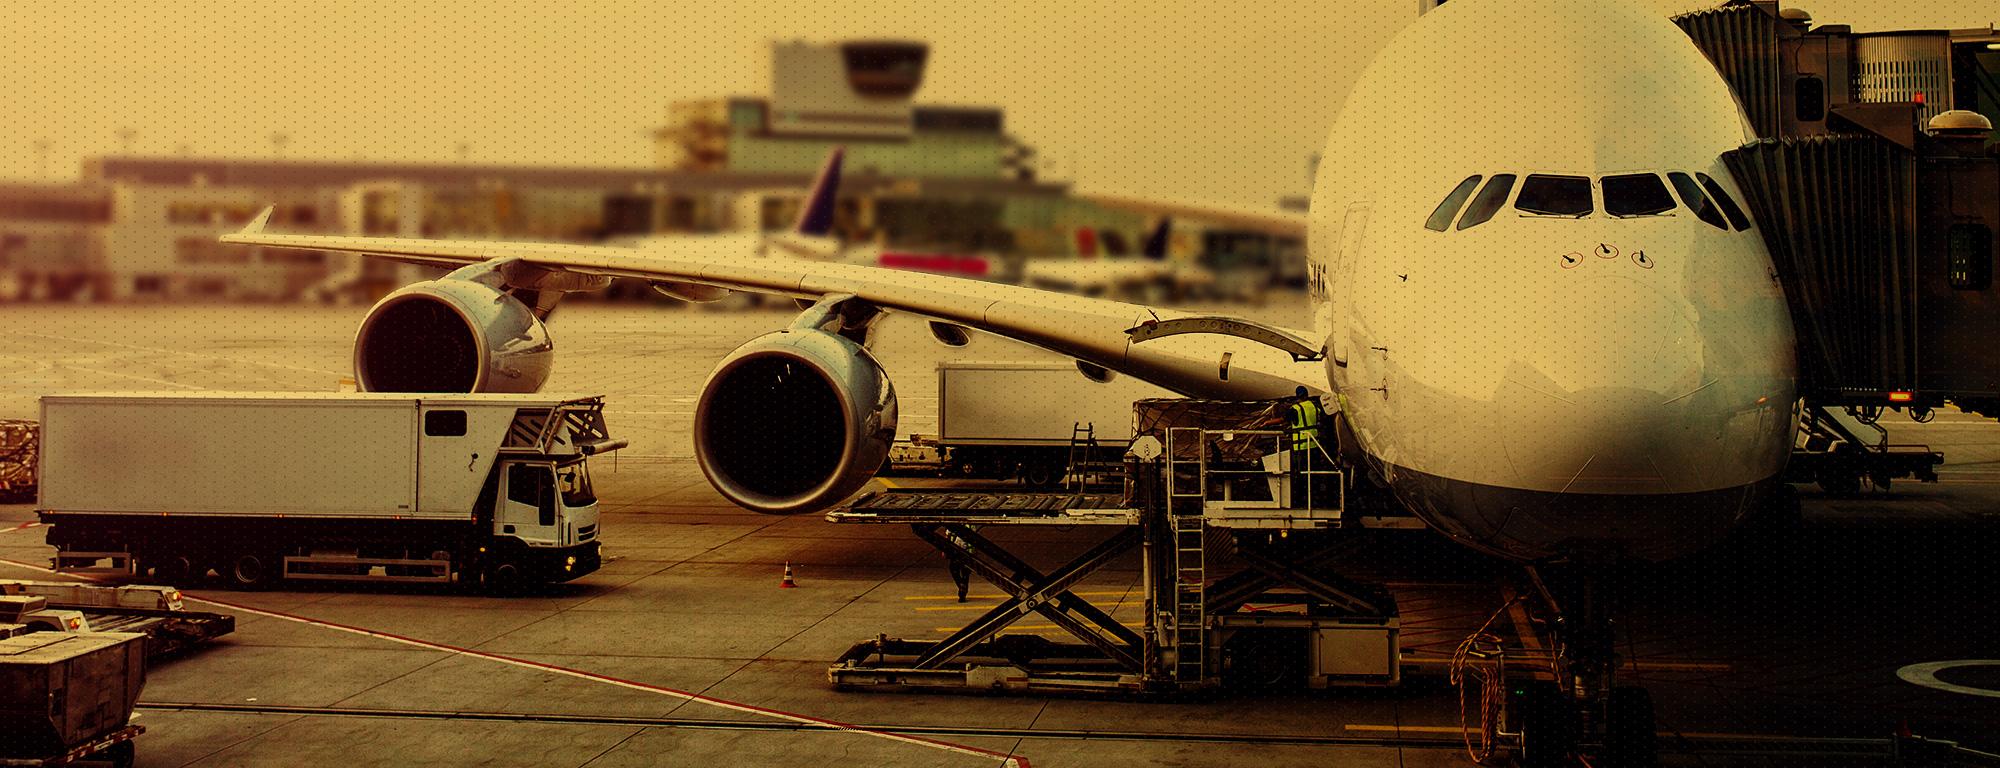 Plane being maintenance